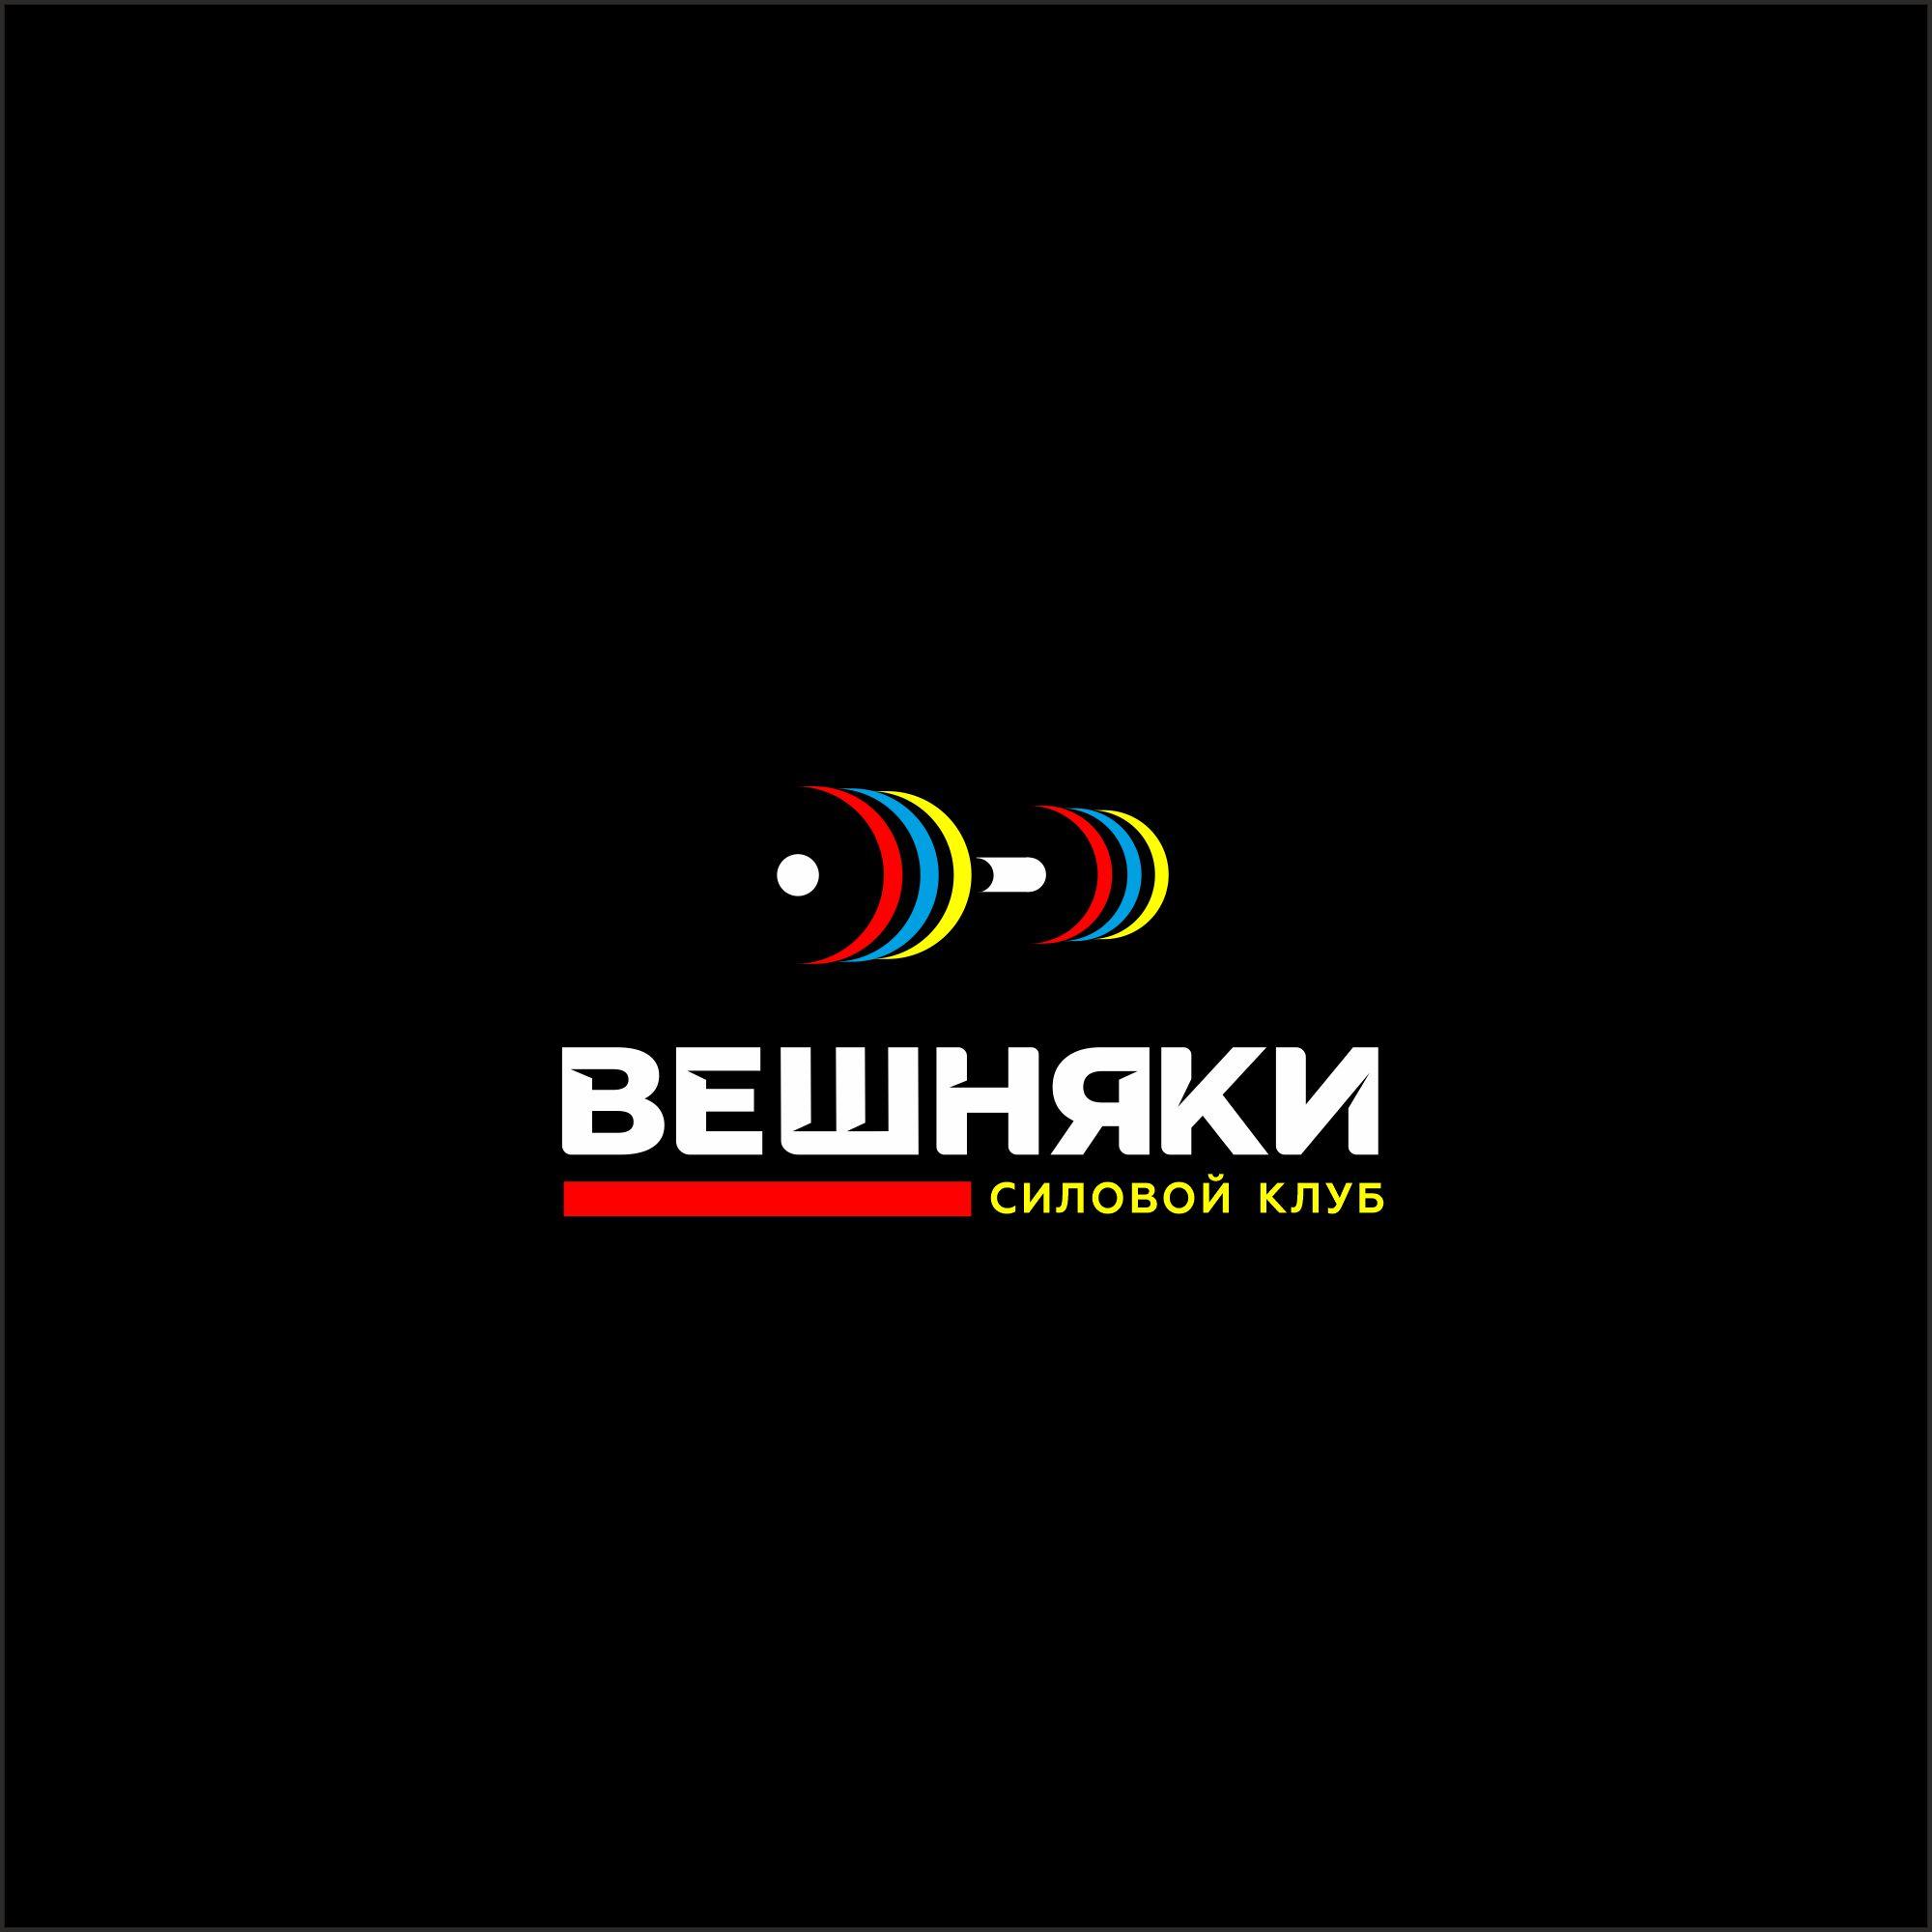 Адаптация (разработка) логотипа Силового клуба ВЕШНЯКИ в инт фото f_8115fbb8c6466225.jpg